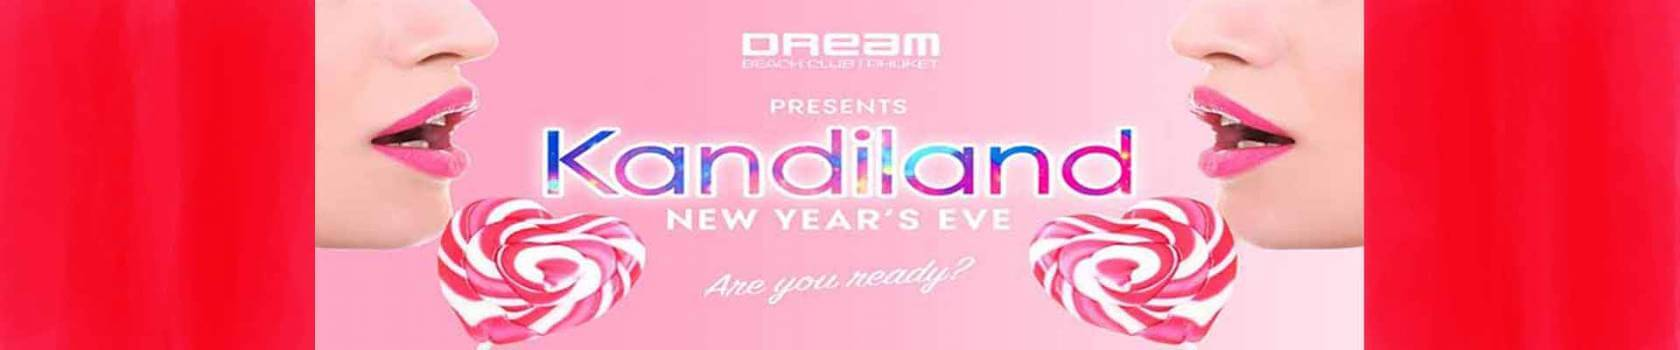 Dream Beach Club presents Kandiland